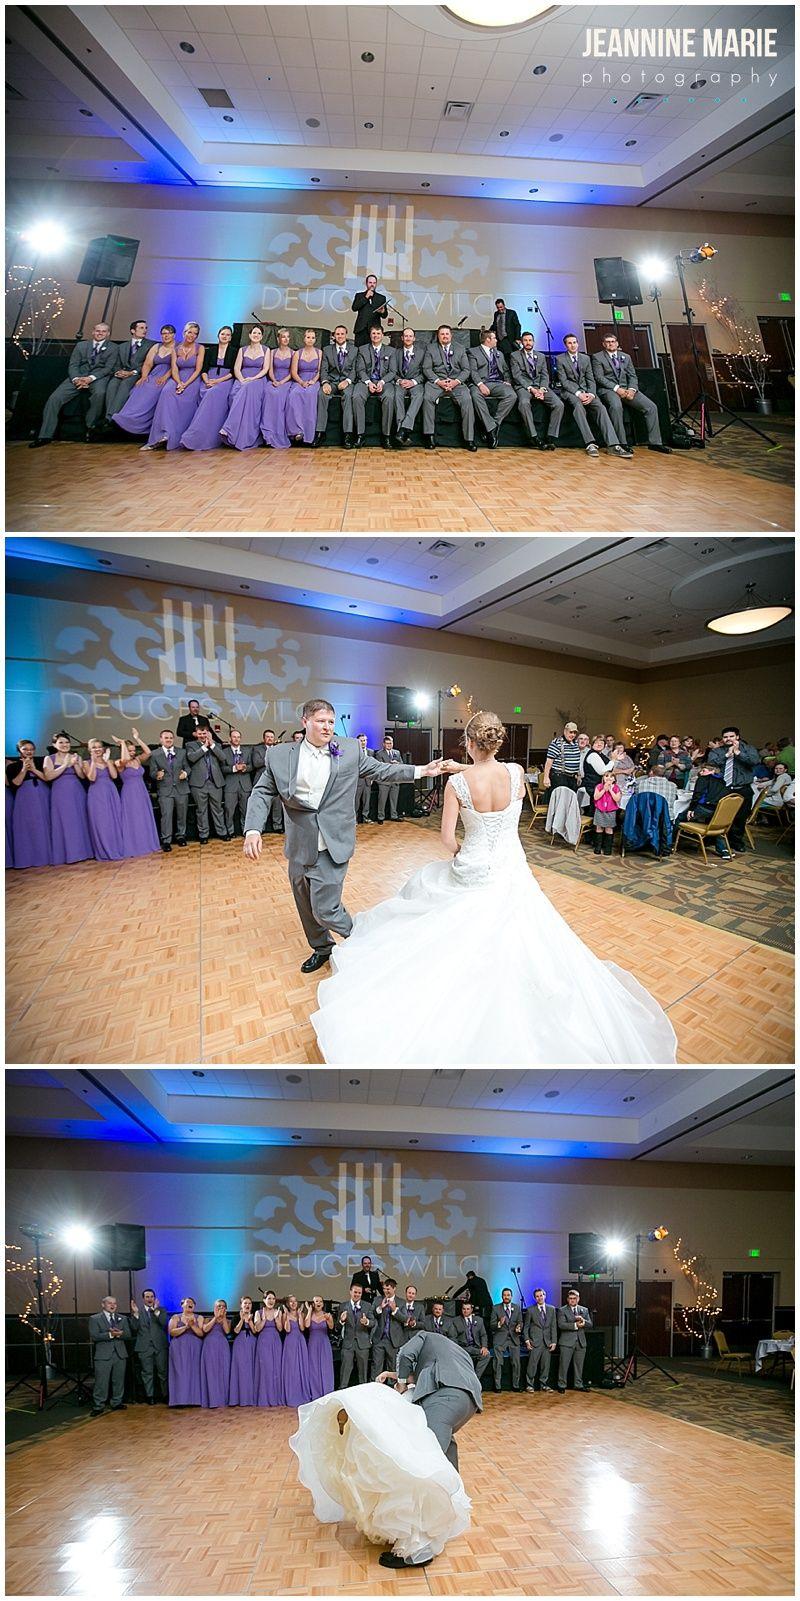 Wedding reception at Sanford Center in Bemidji